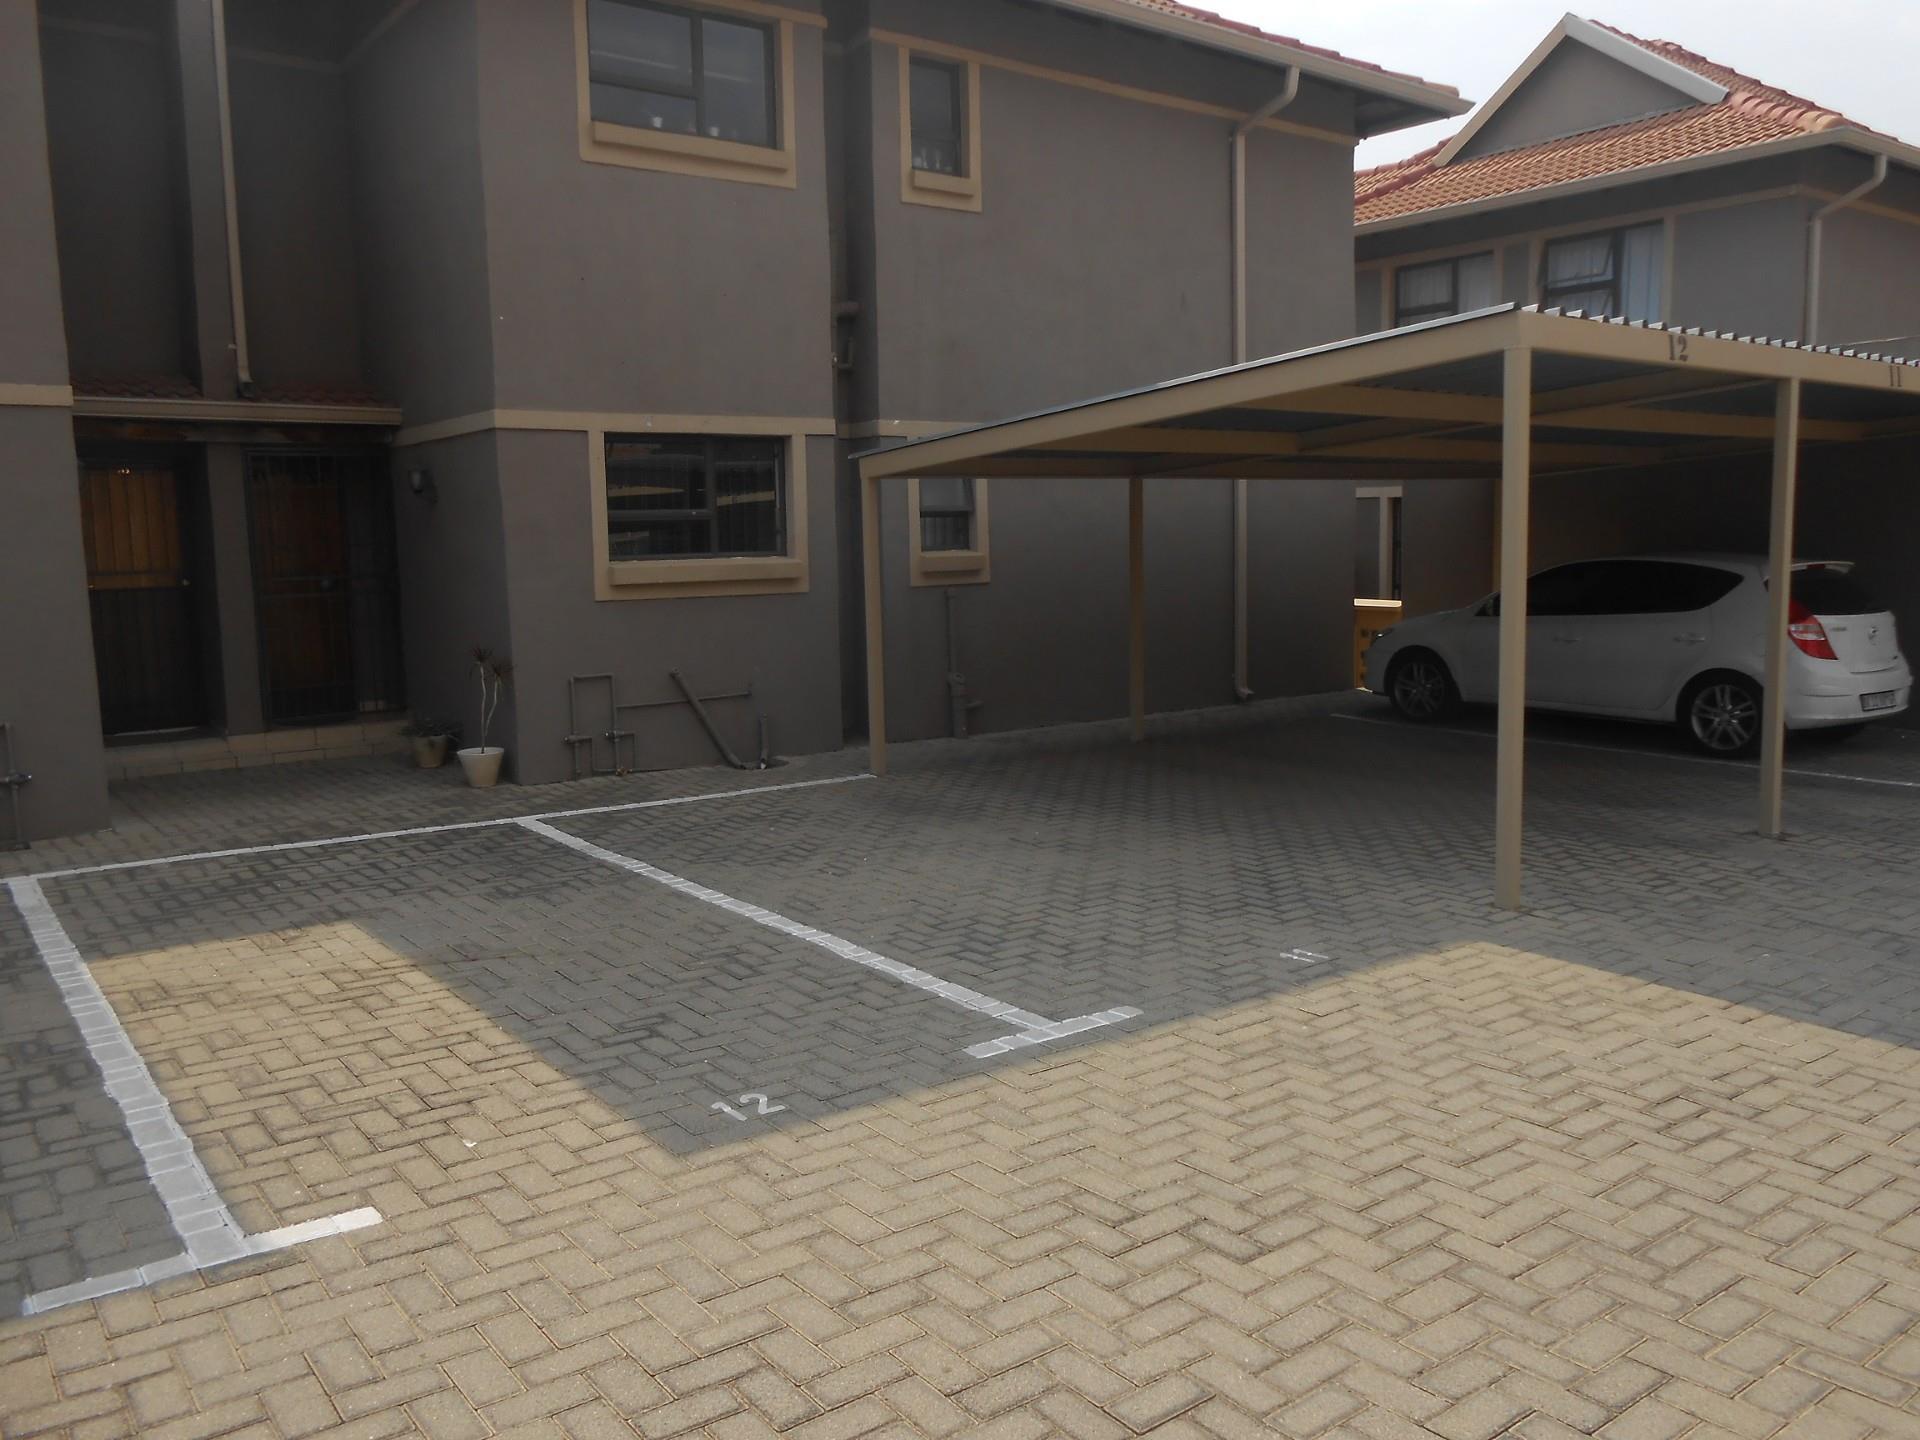 3 Bedroom Apartment / Flat To Rent in New Market